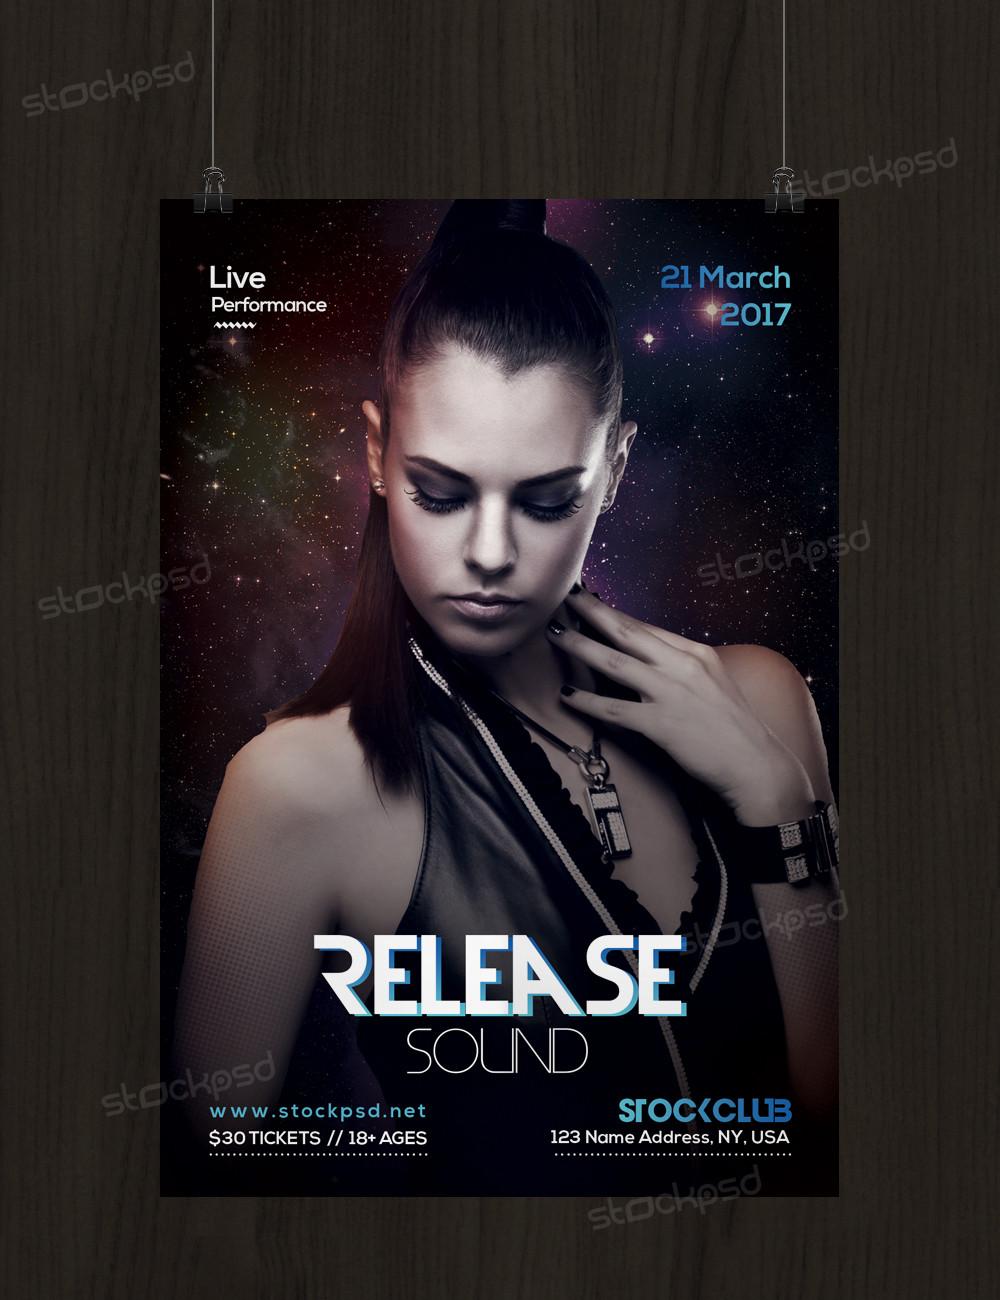 Release Sound – Freebie PSD Flyer Template